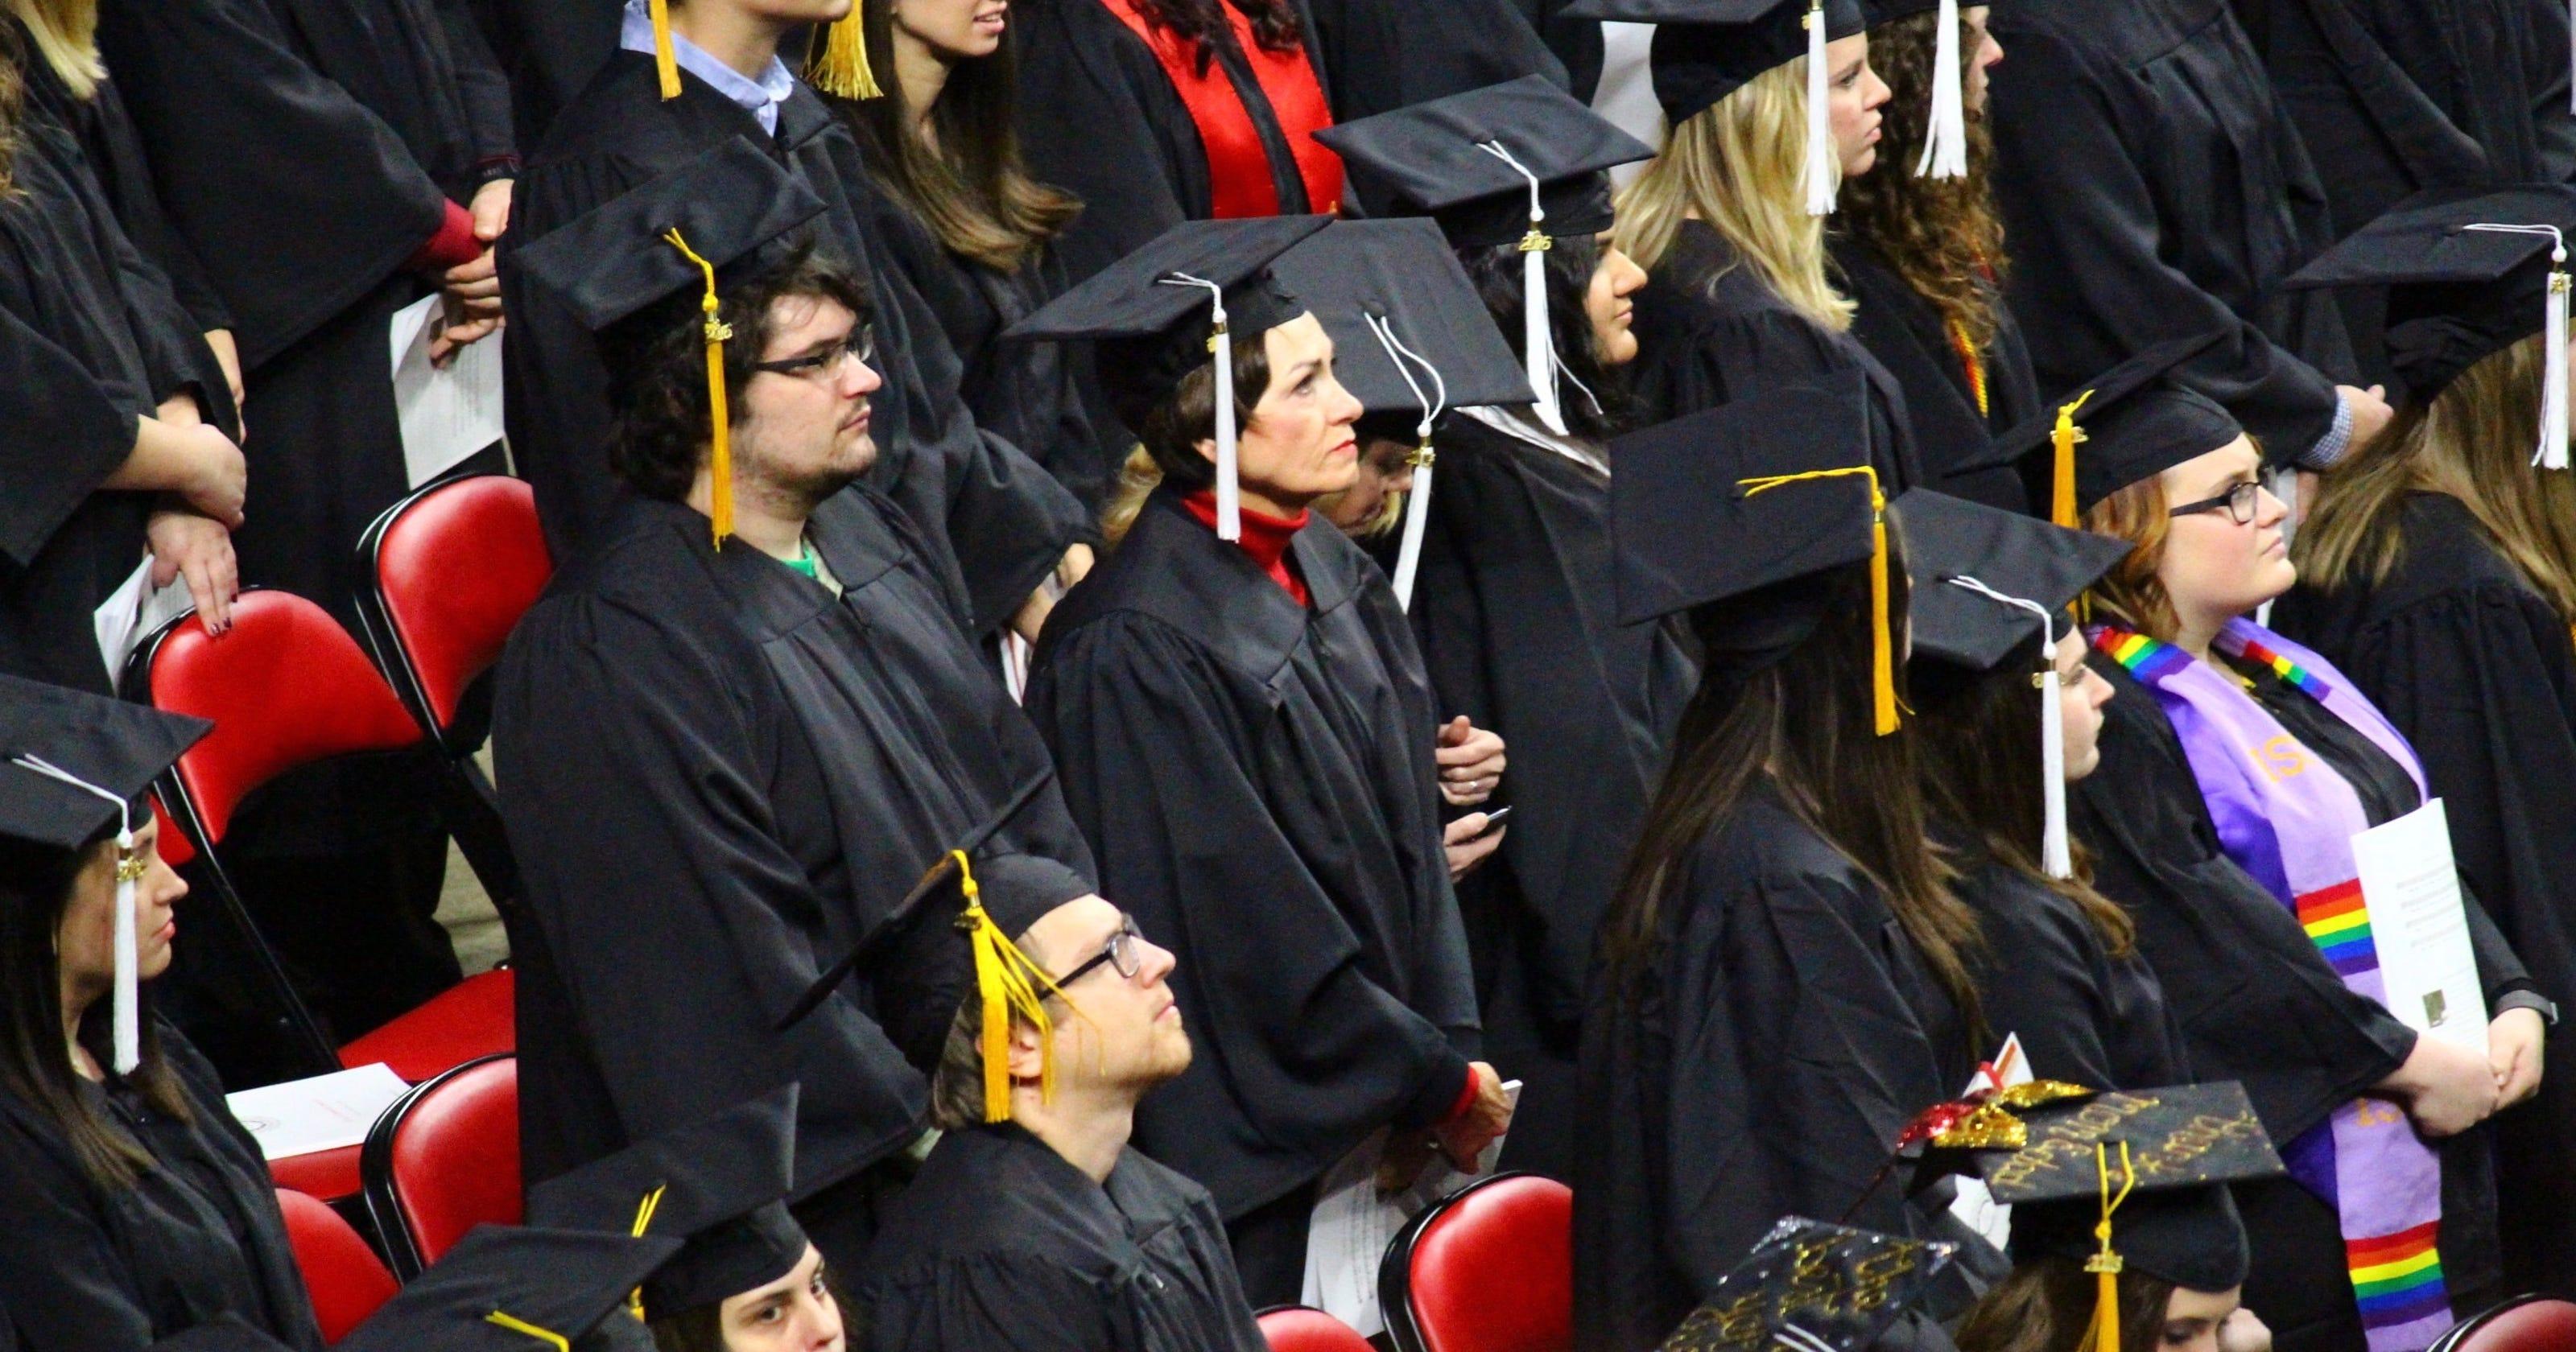 Lt. Gov. Kim Reynolds graduates from Iowa State